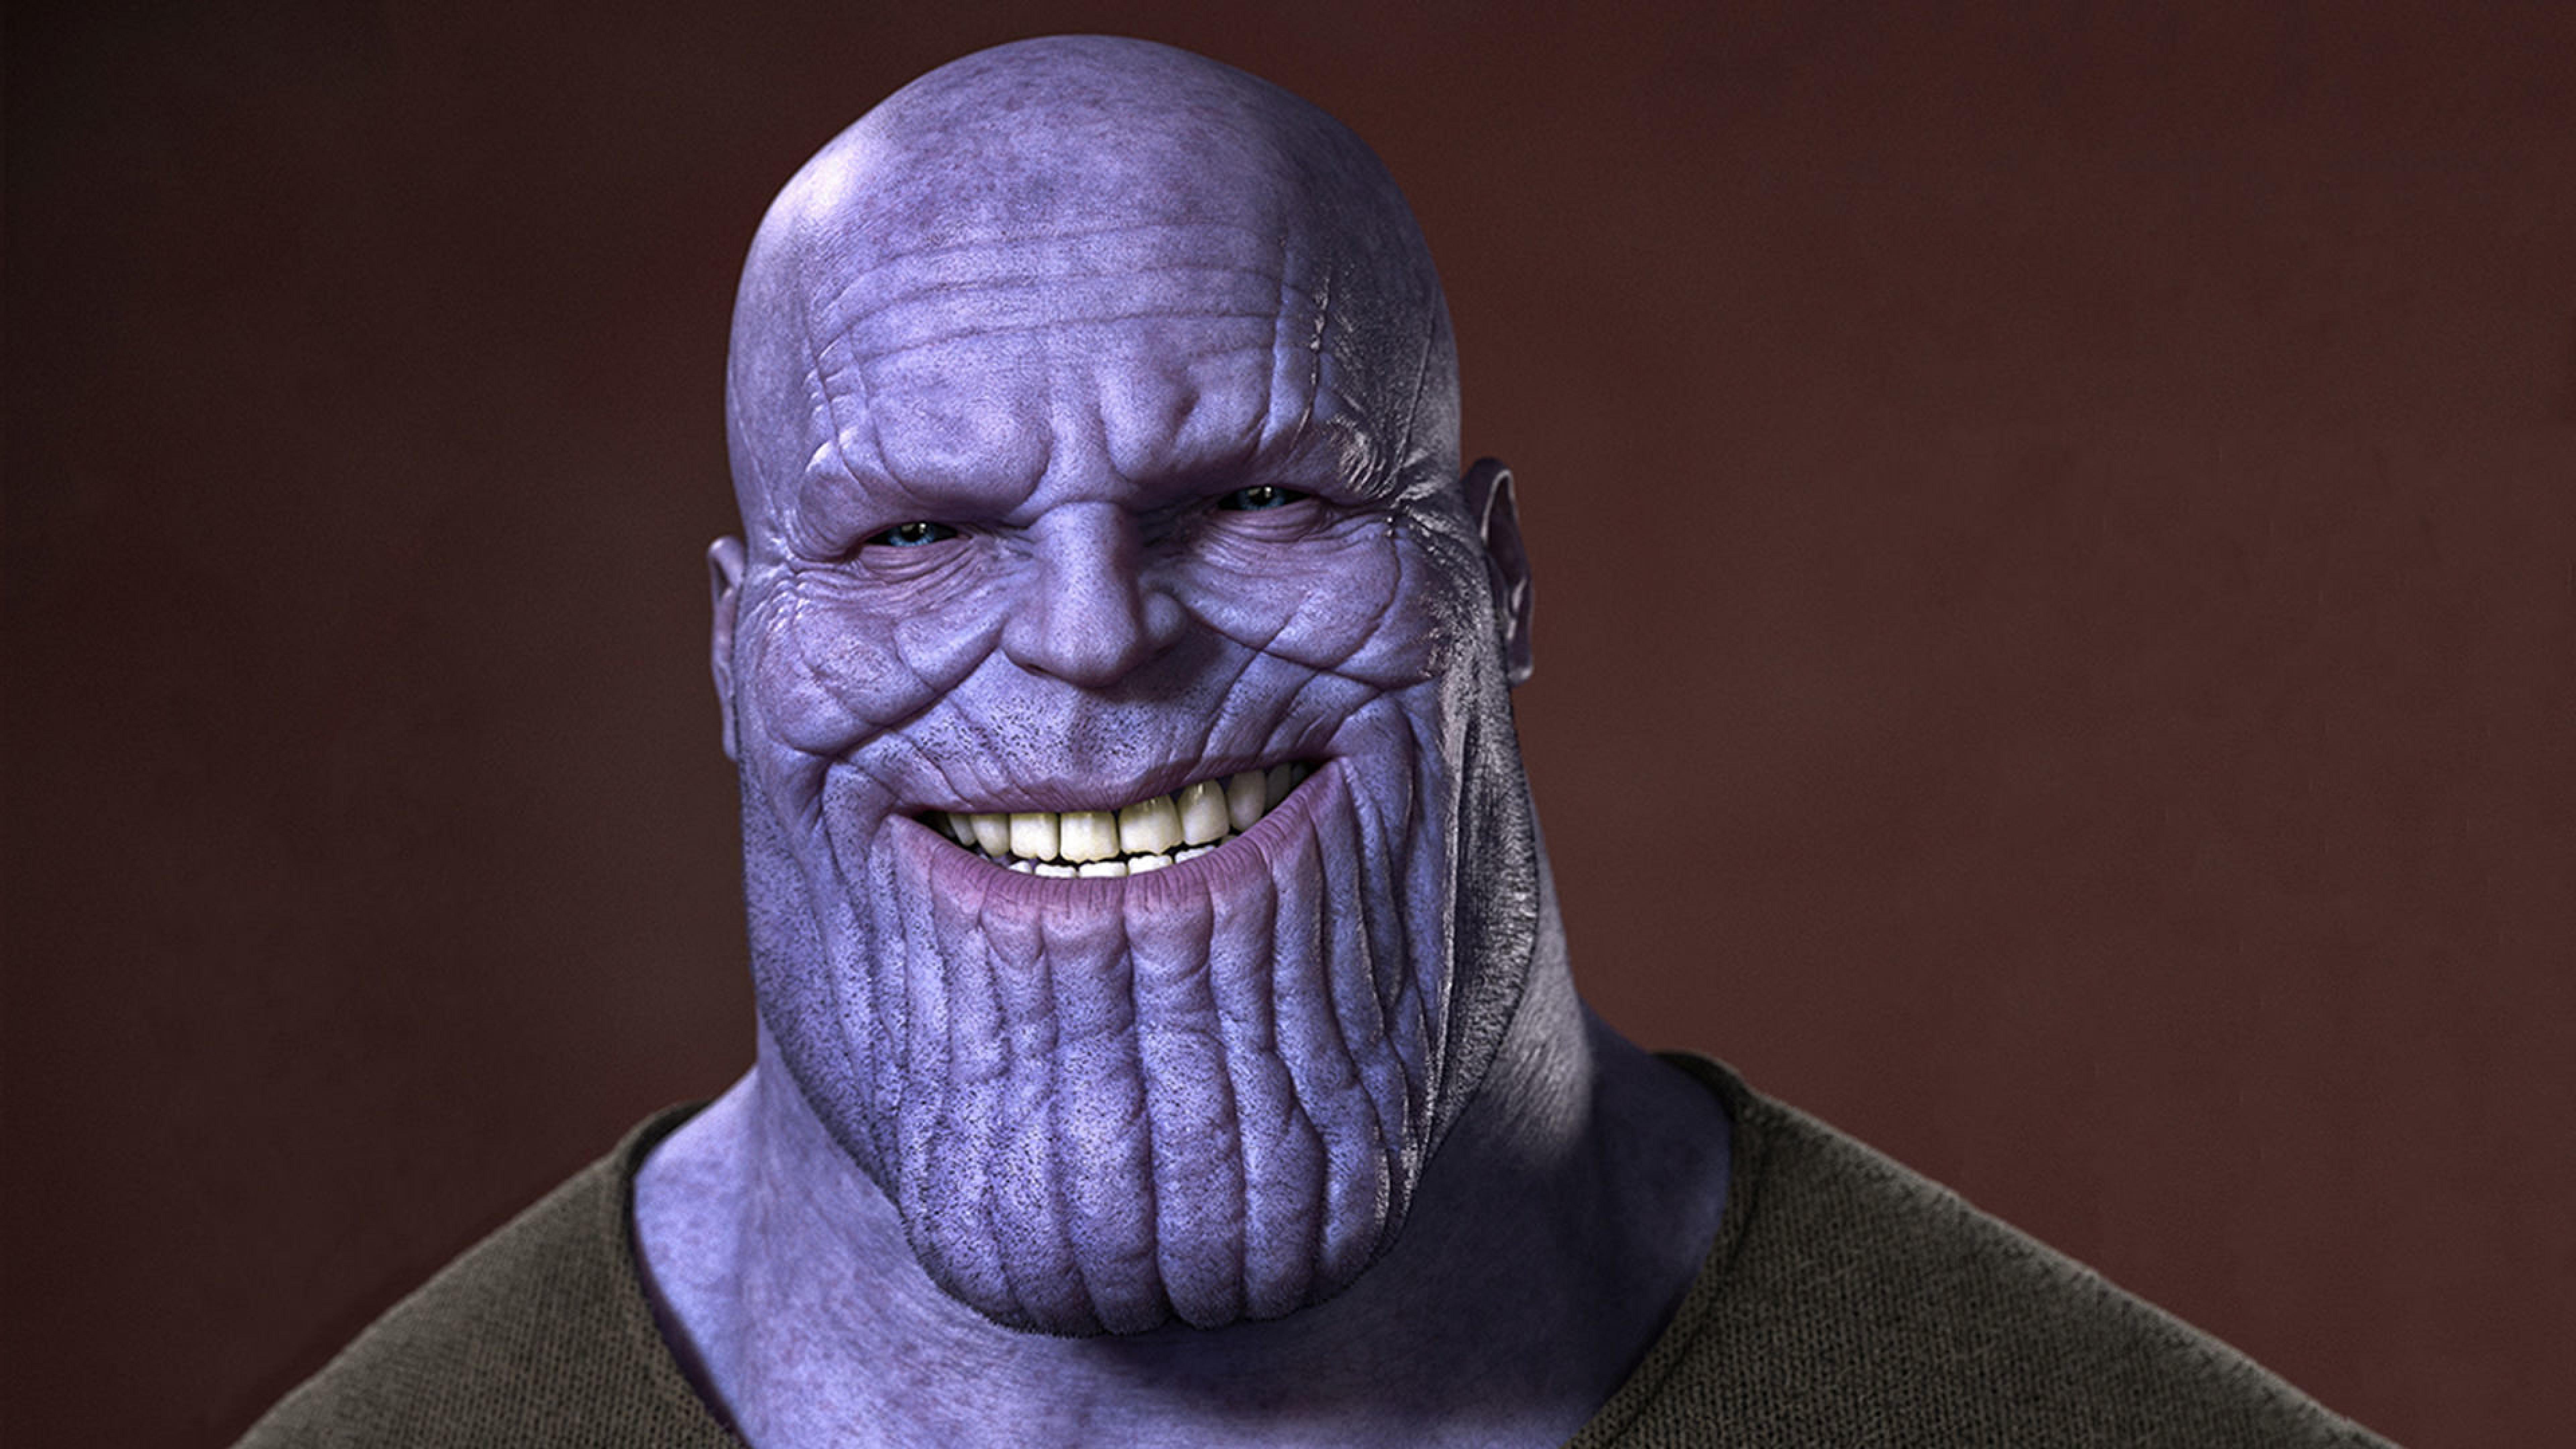 Thanos Smiling, Full HD Wallpaper